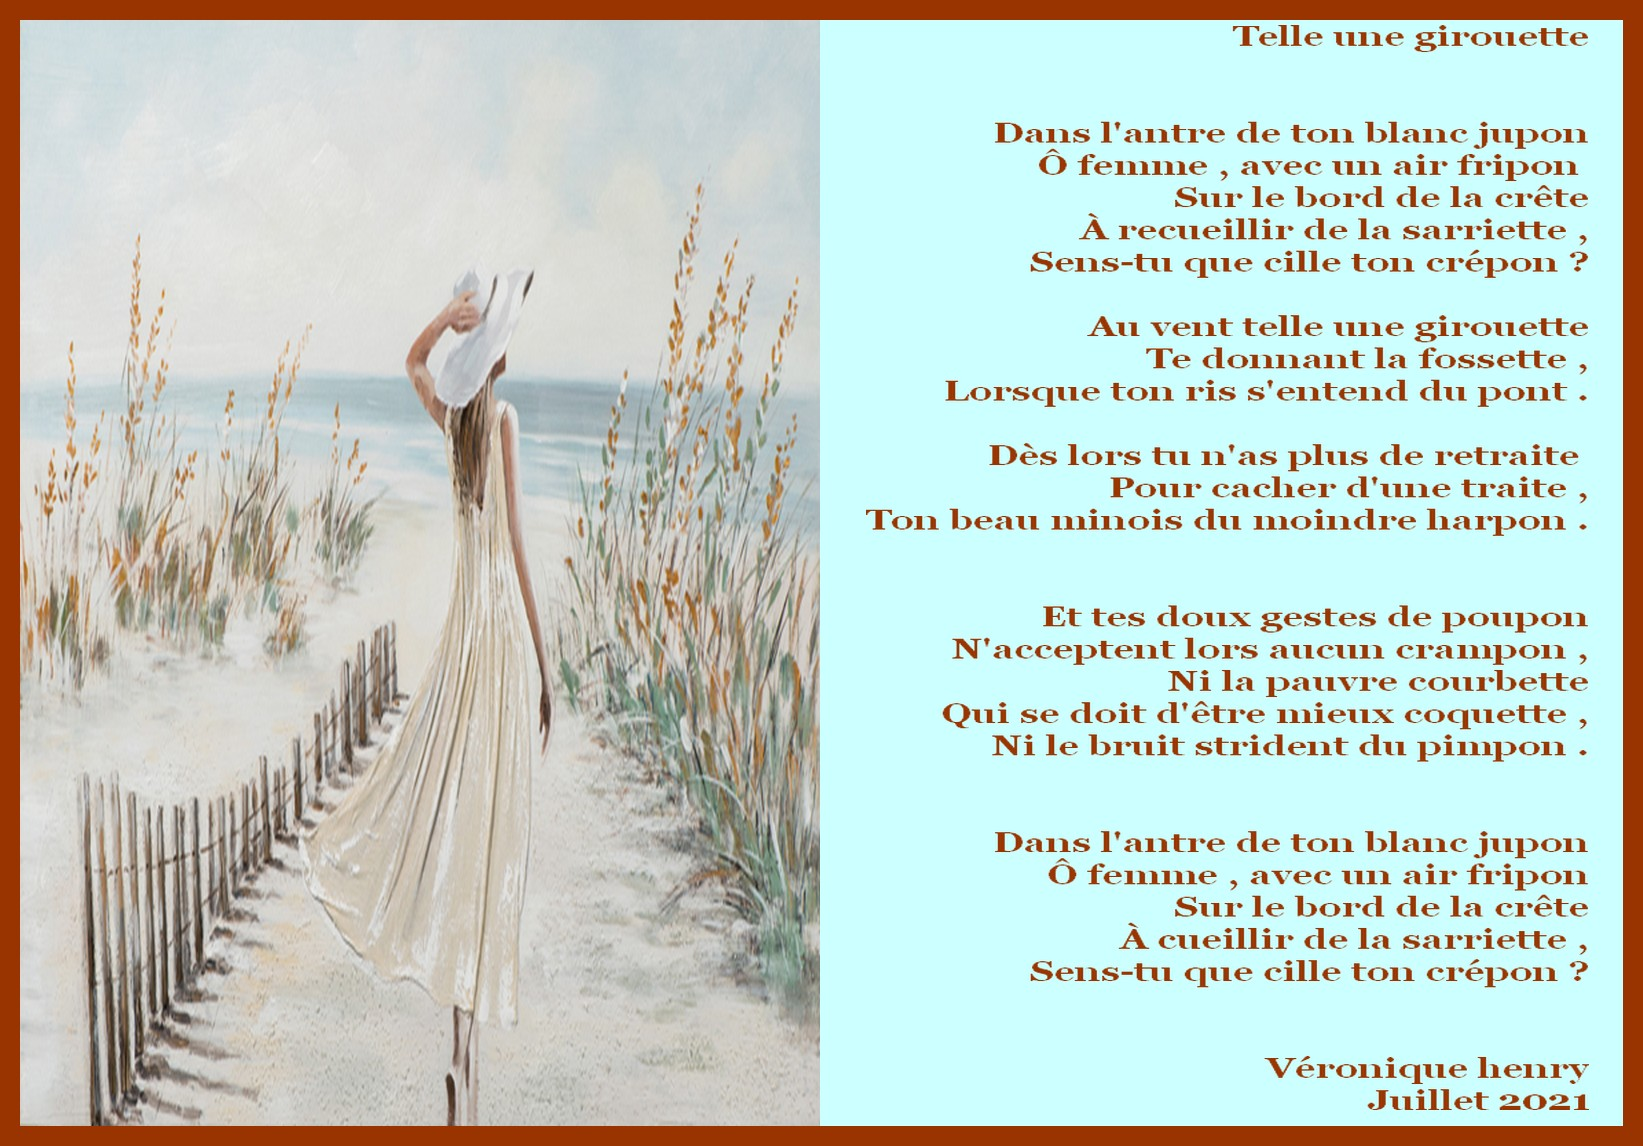 tableau-bord-de-mer-avec-jeune-femme-5fe23d8412b5e